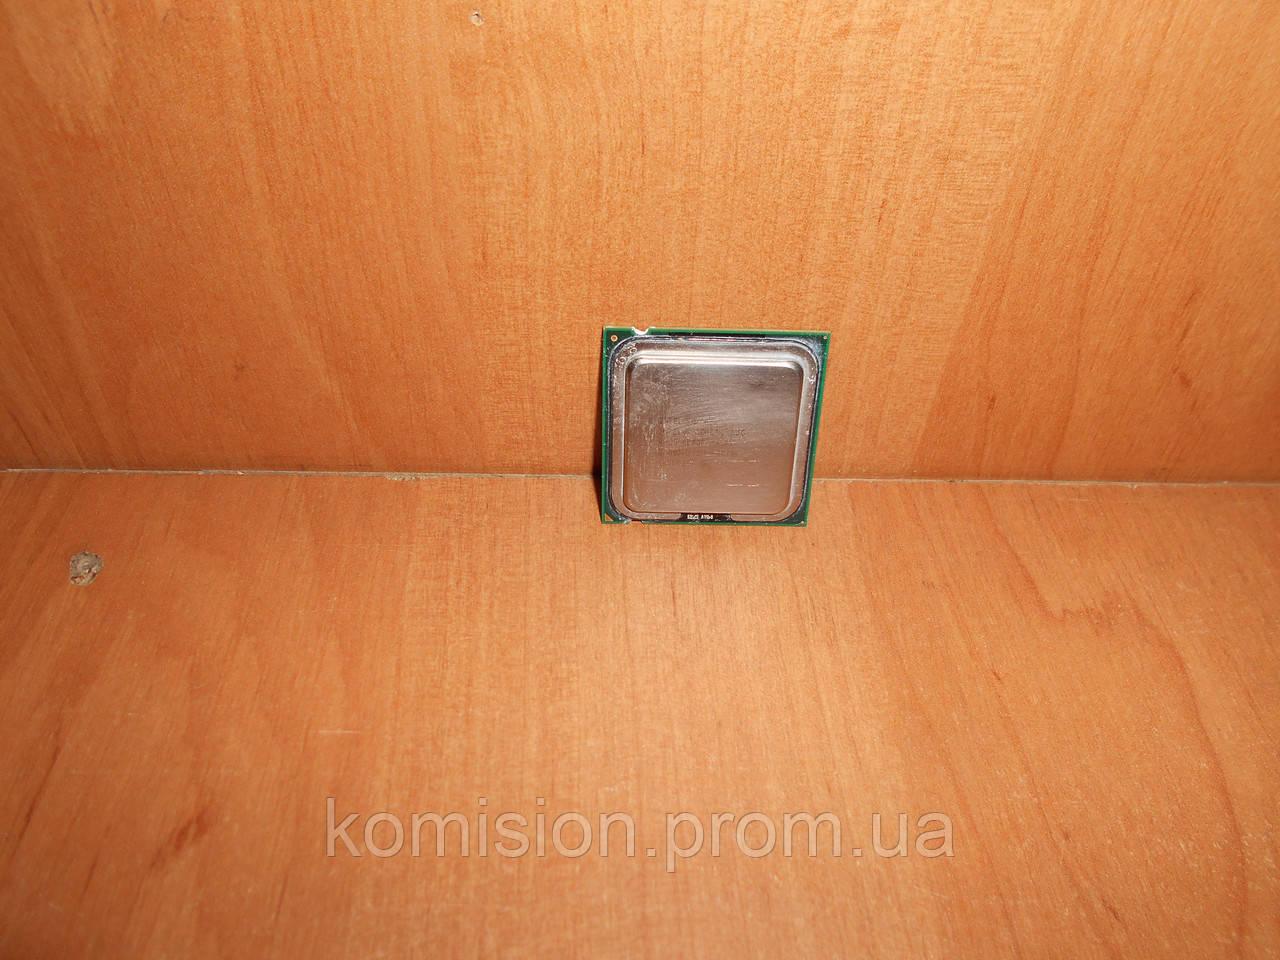 Процессор ntel Core 2 Duo E4400 Allendale 2 GHz s775